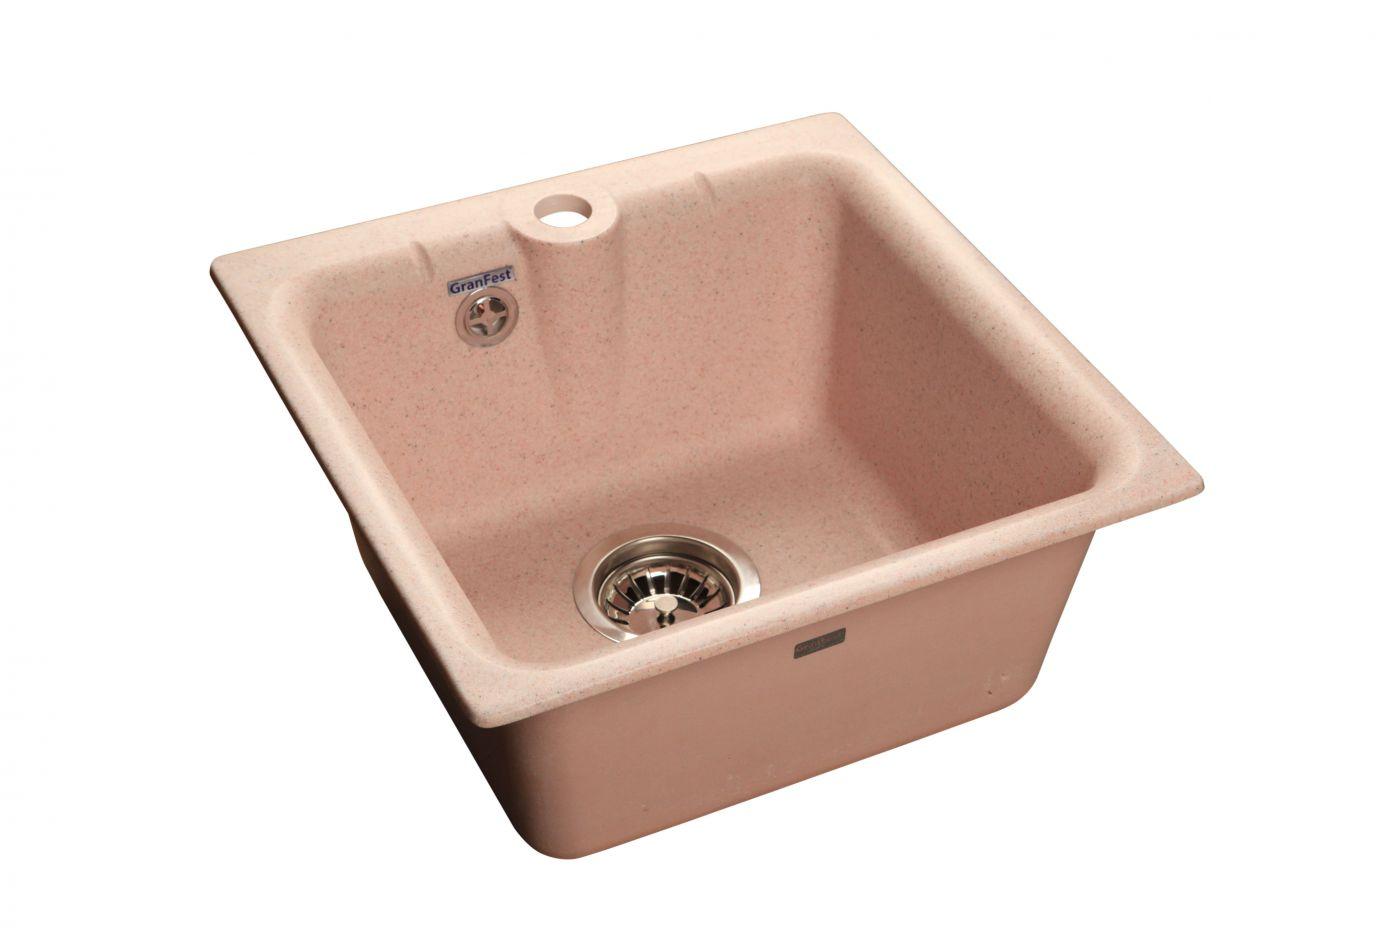 Мраморная мойка GranFest Practik GF-P420 Светло-Розовый